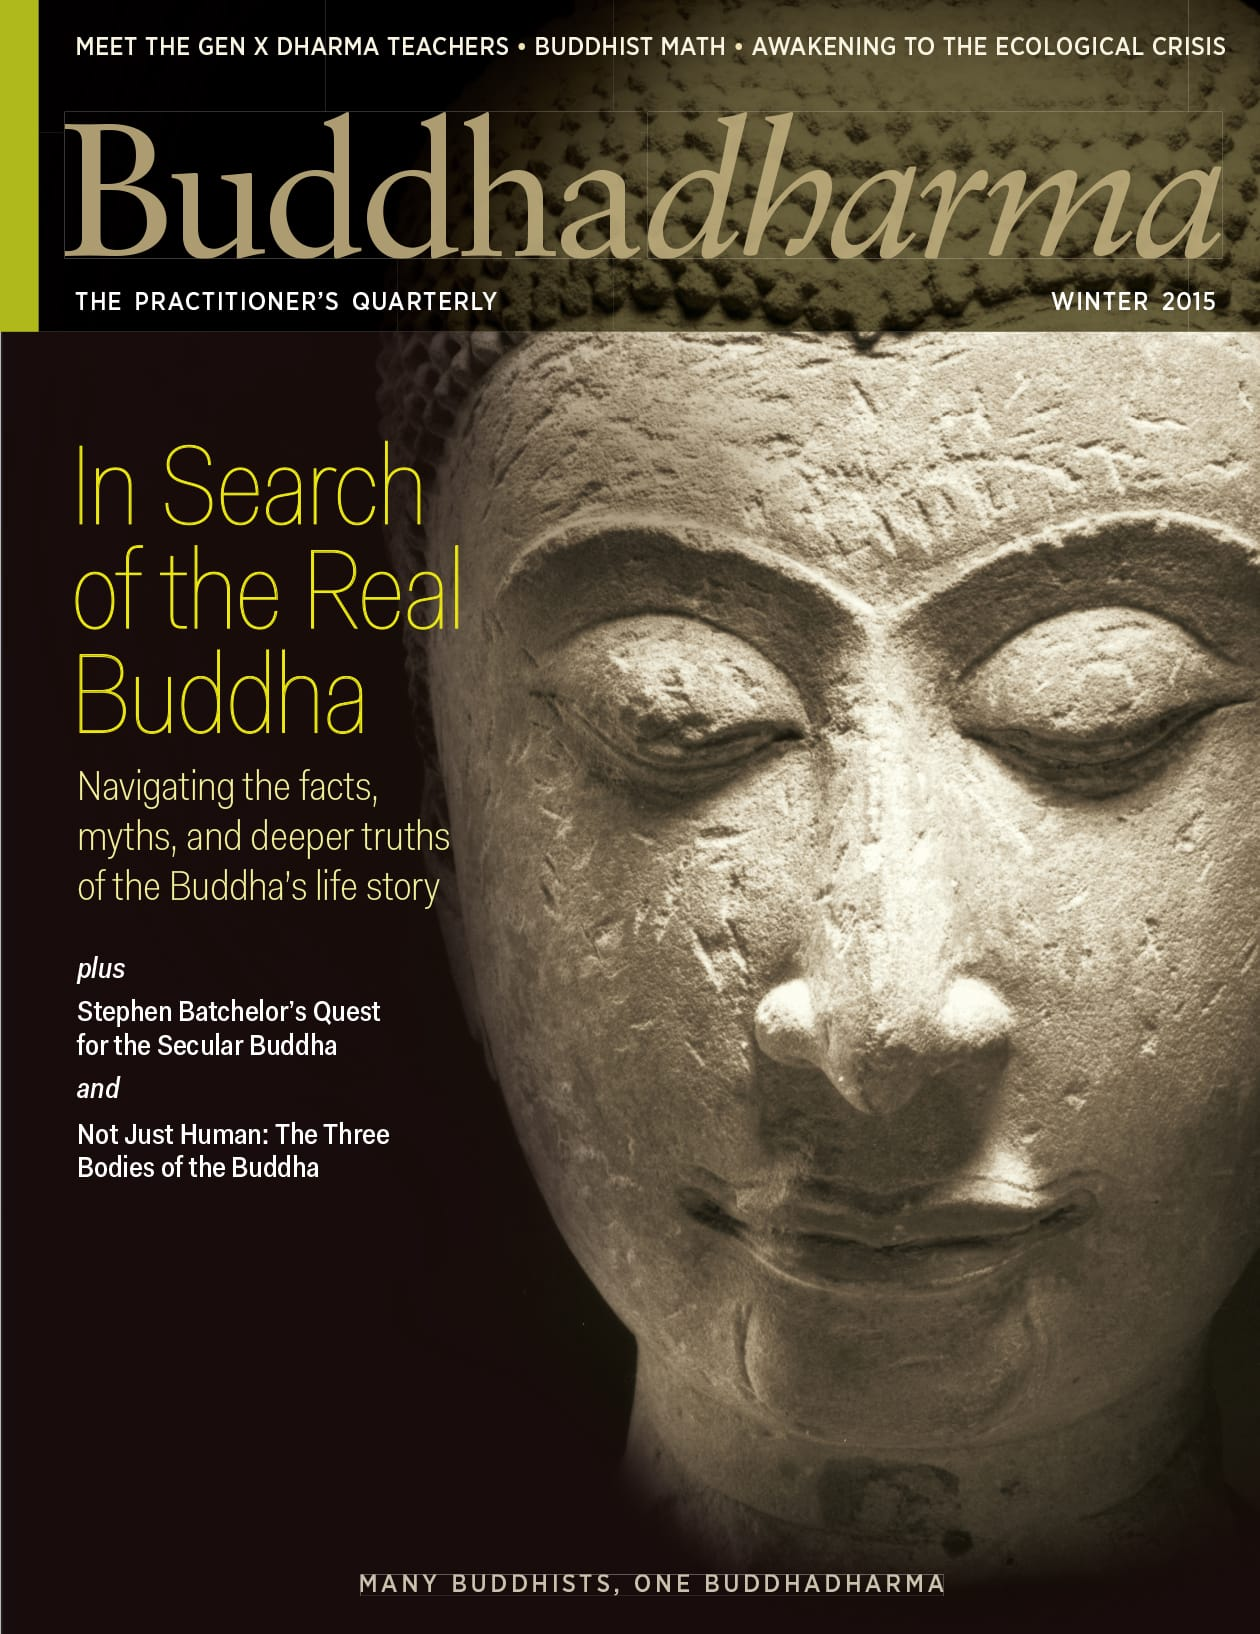 Buddhadharma, Buddha, Winter, 2015, Lion's Roar